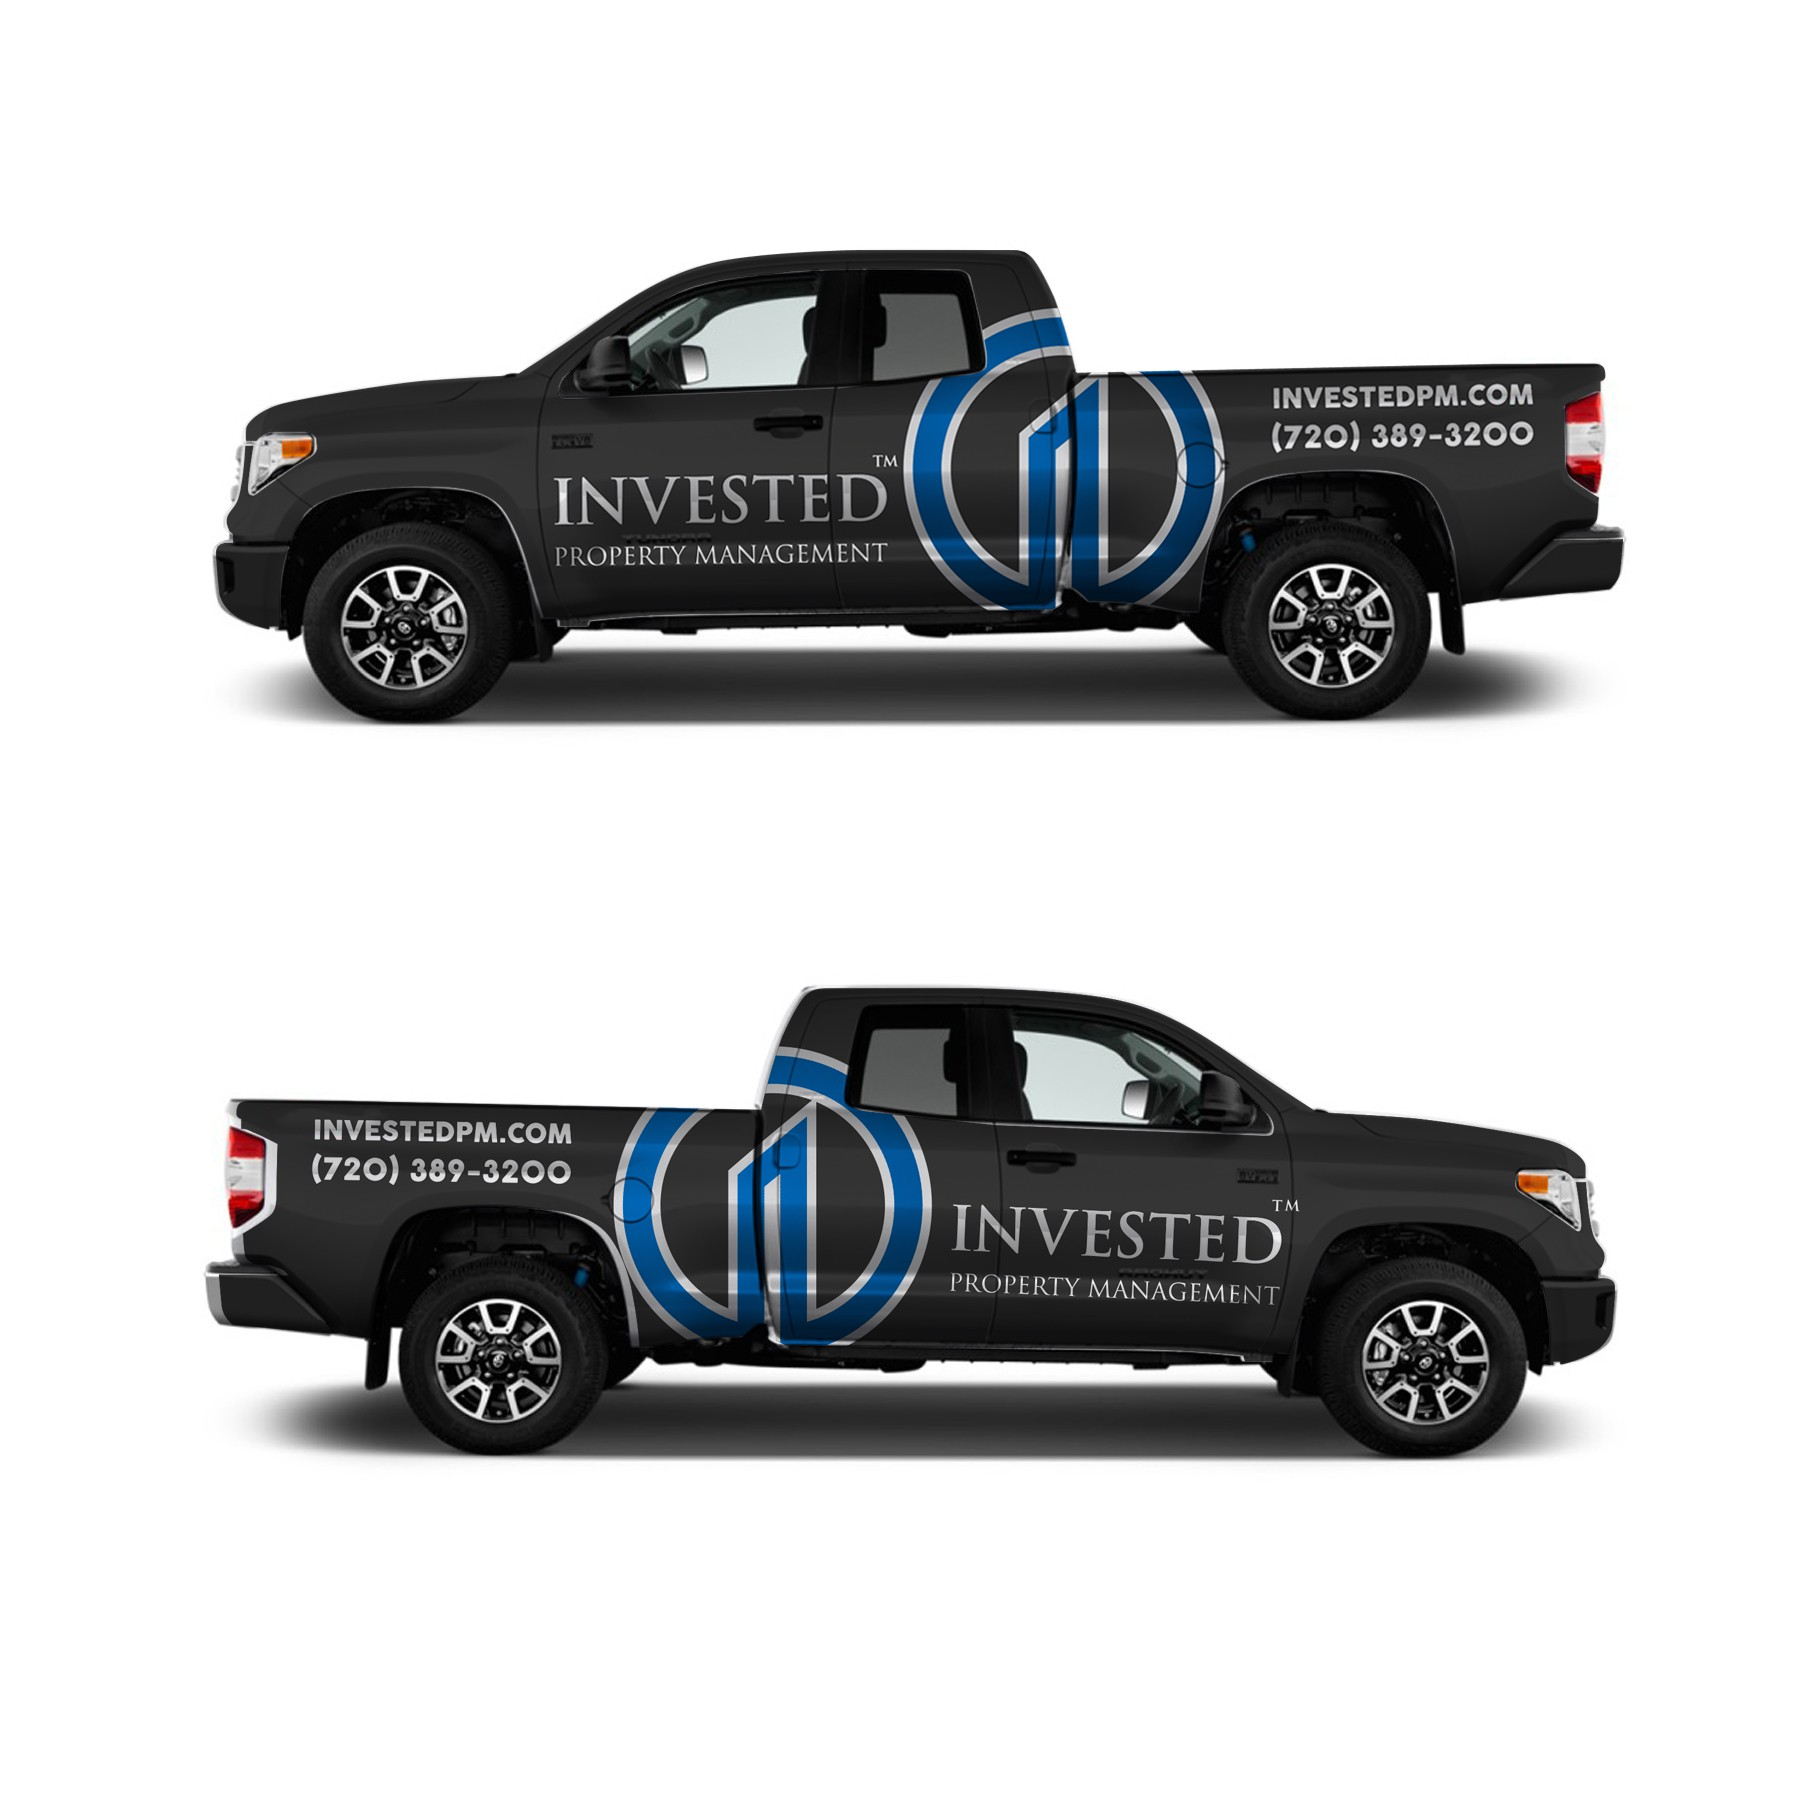 Truck Wrap Design - Property Management/Real Estate